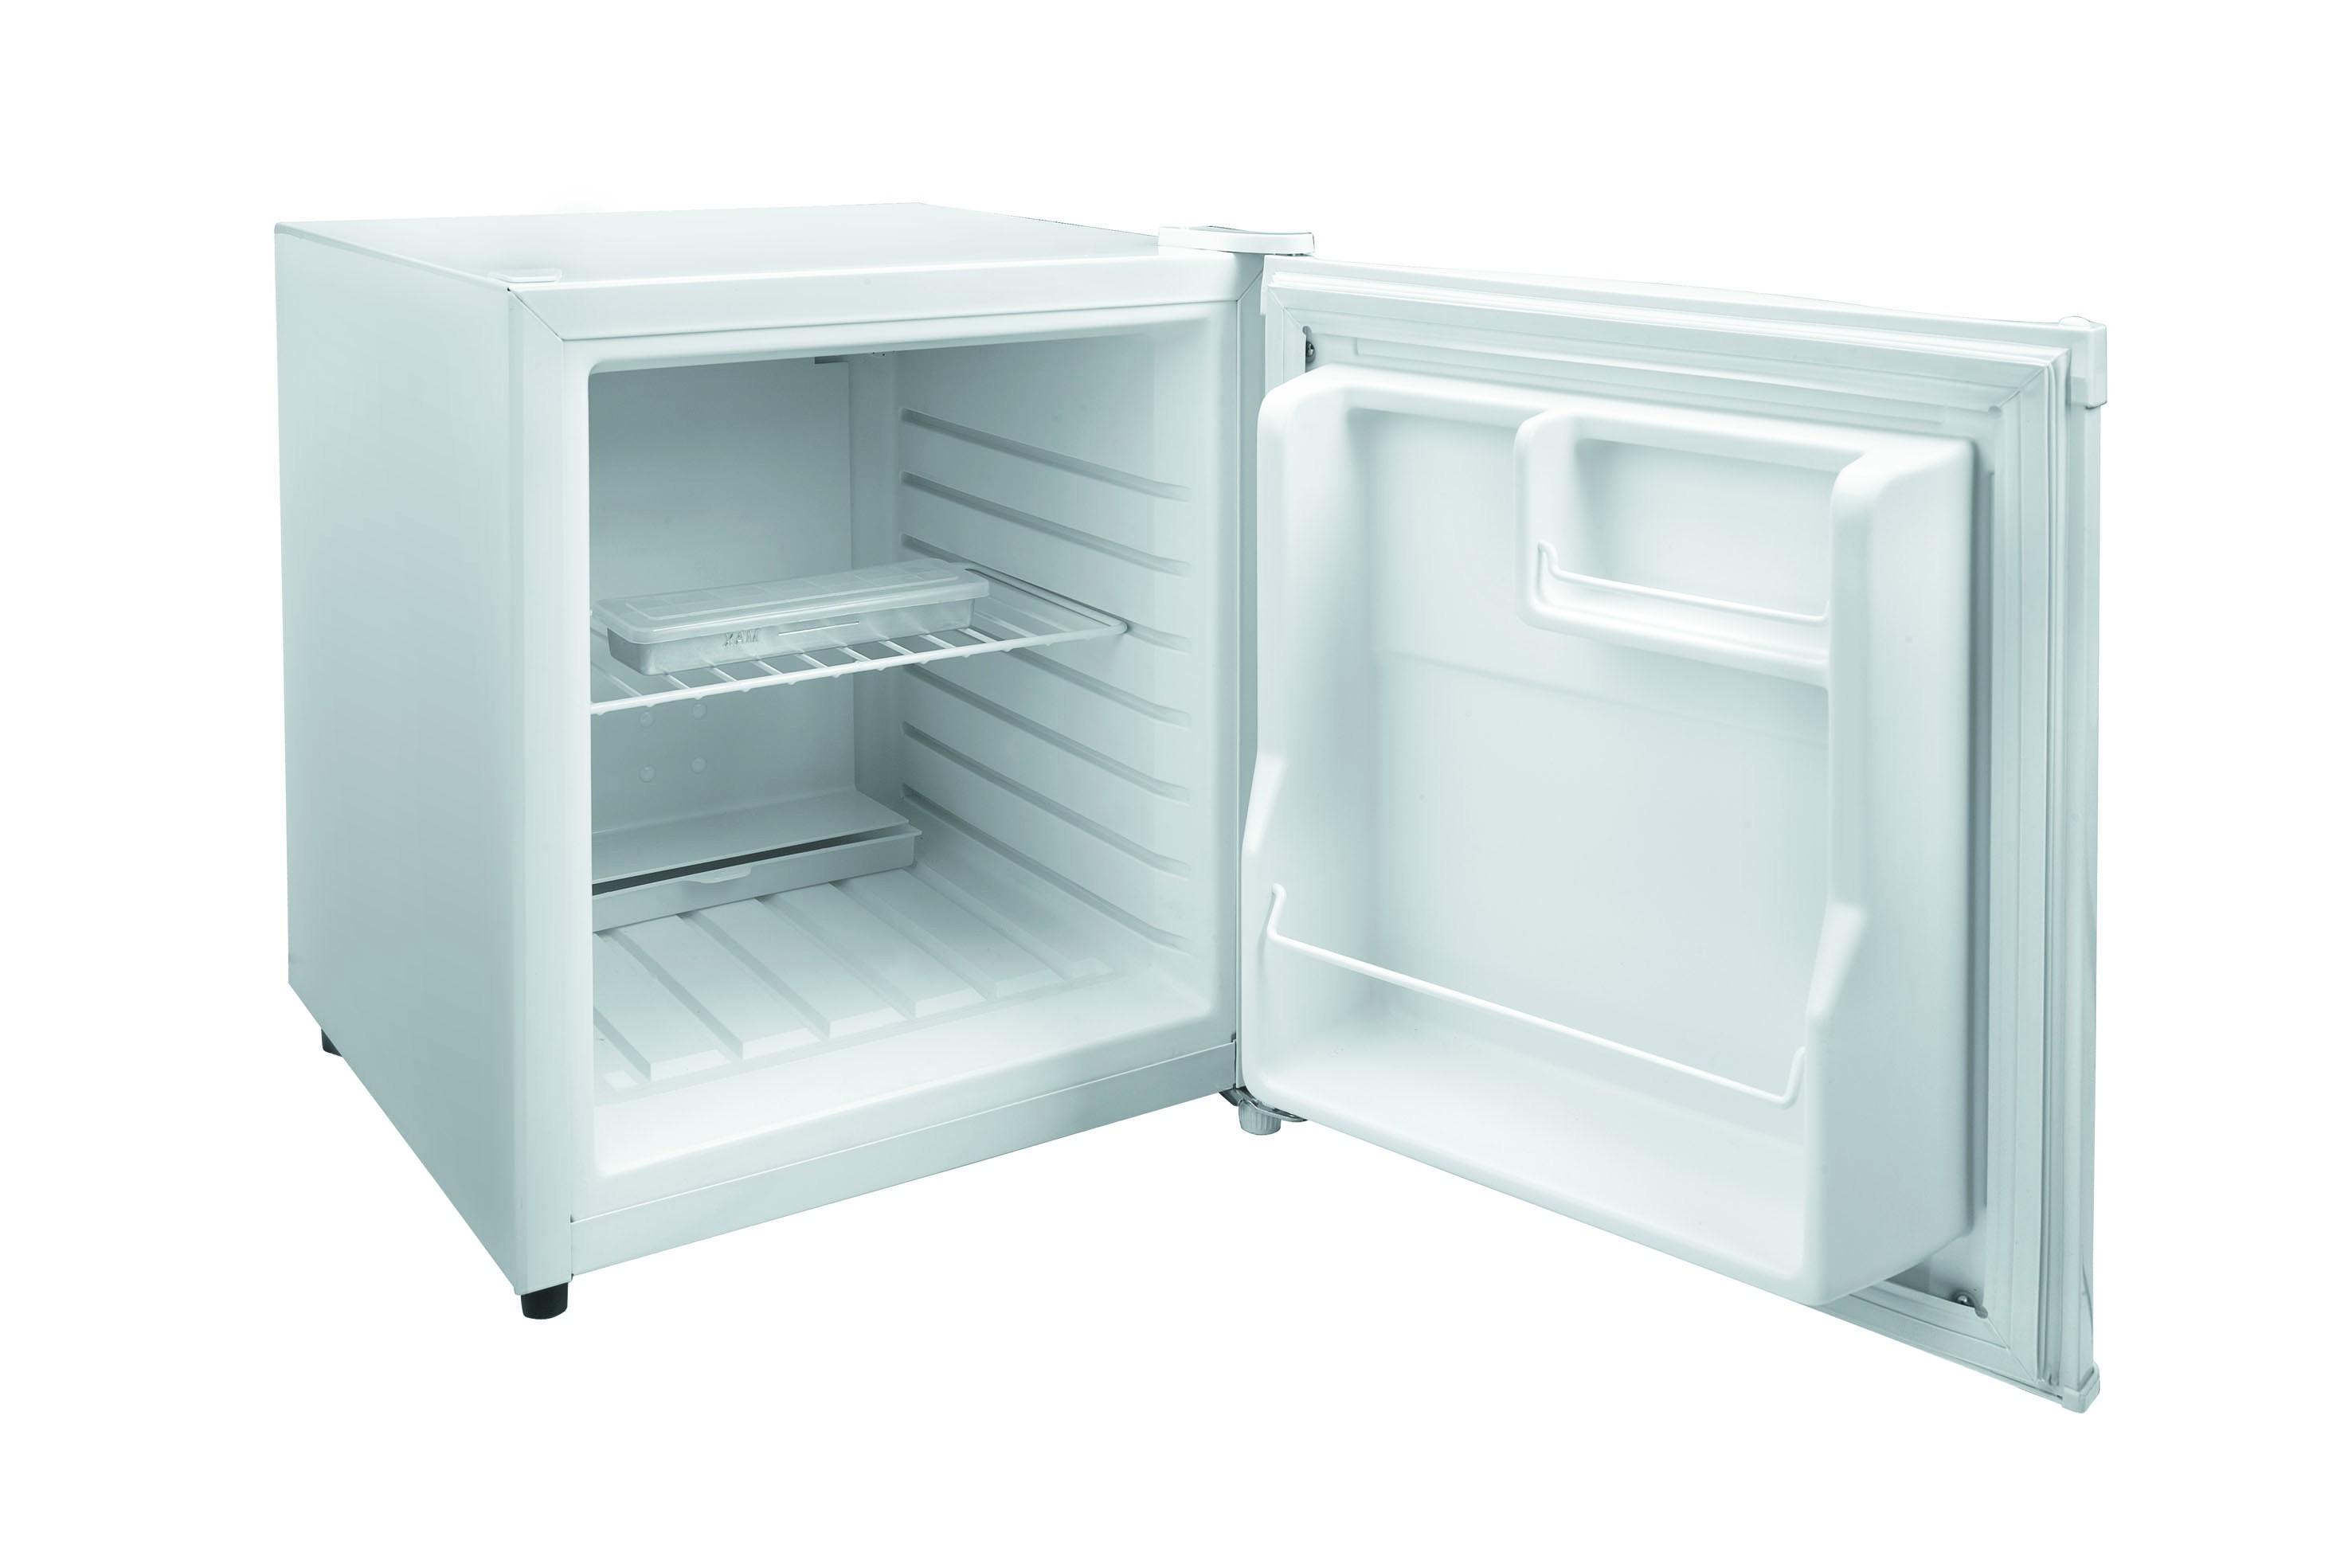 mini frigo de bureau 28 images quelques liens utiles mini frigo r 233 frig 233 rateur 6l. Black Bedroom Furniture Sets. Home Design Ideas